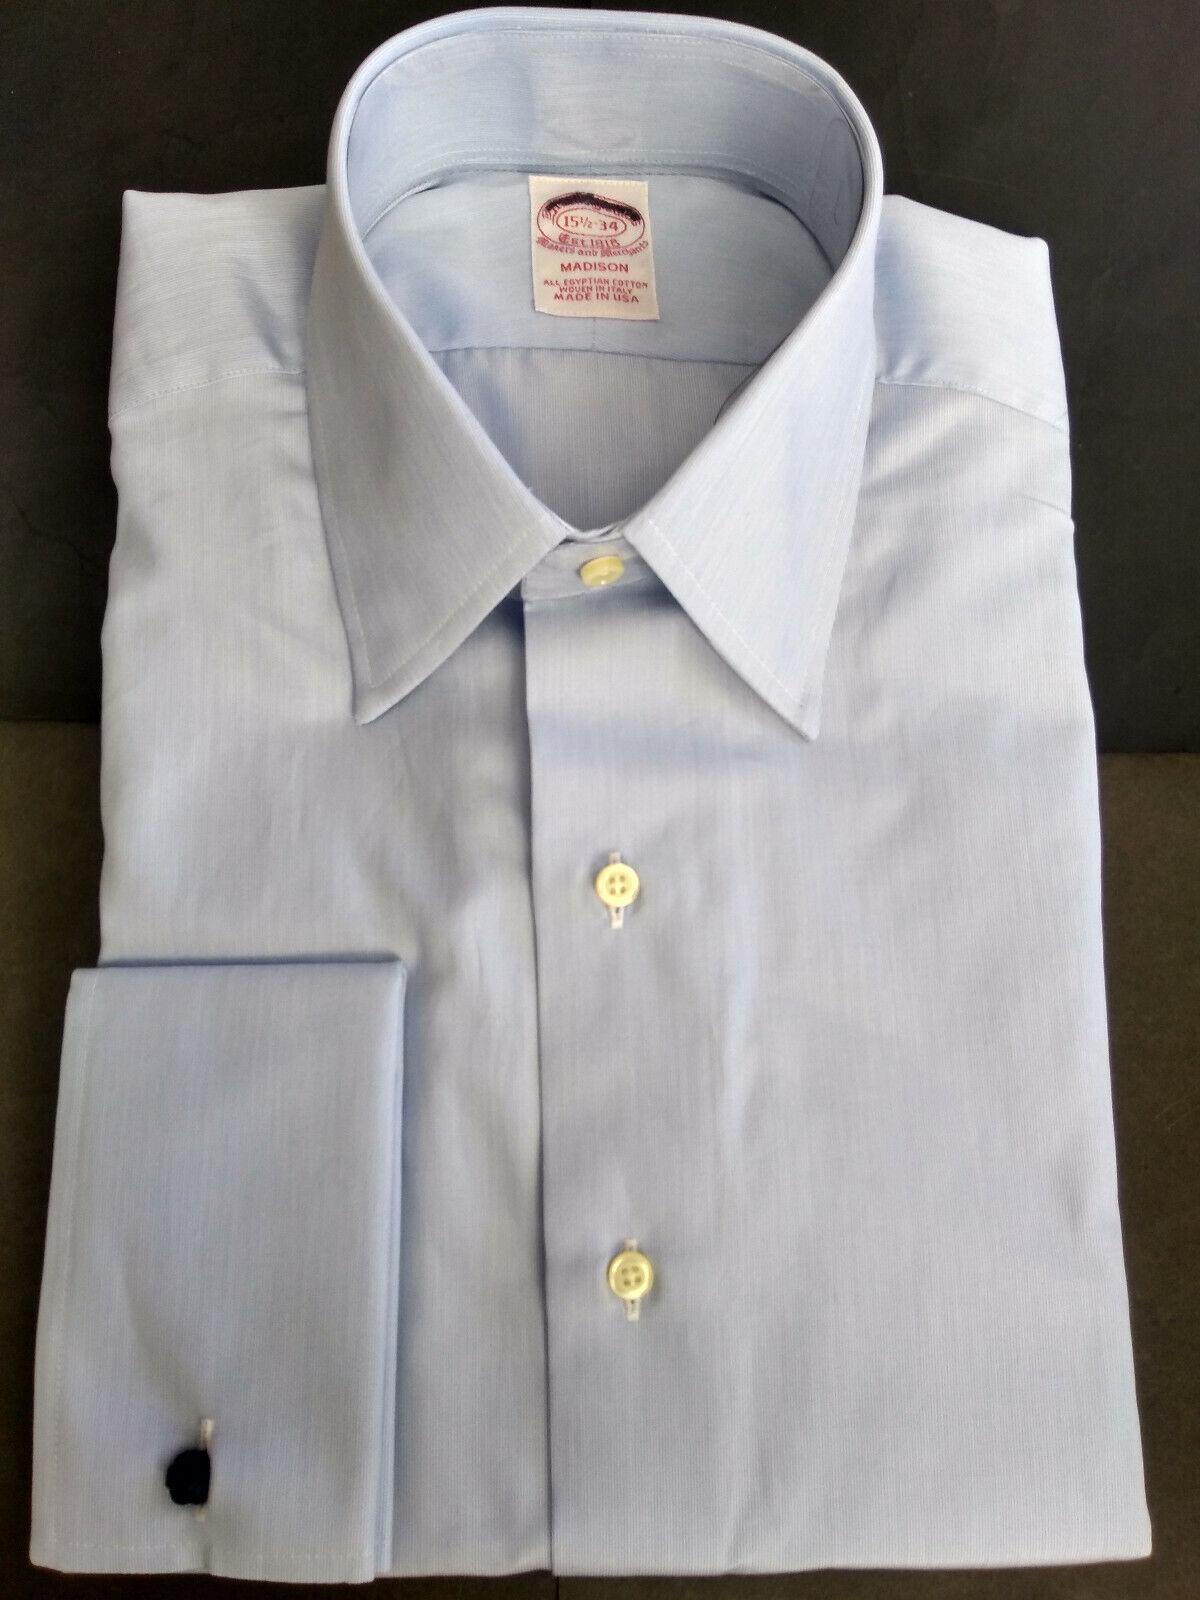 NWOT Brooks Brothers Blau Egyptian Cotton Shirt 15.5-34 Madison USA MSRP  185